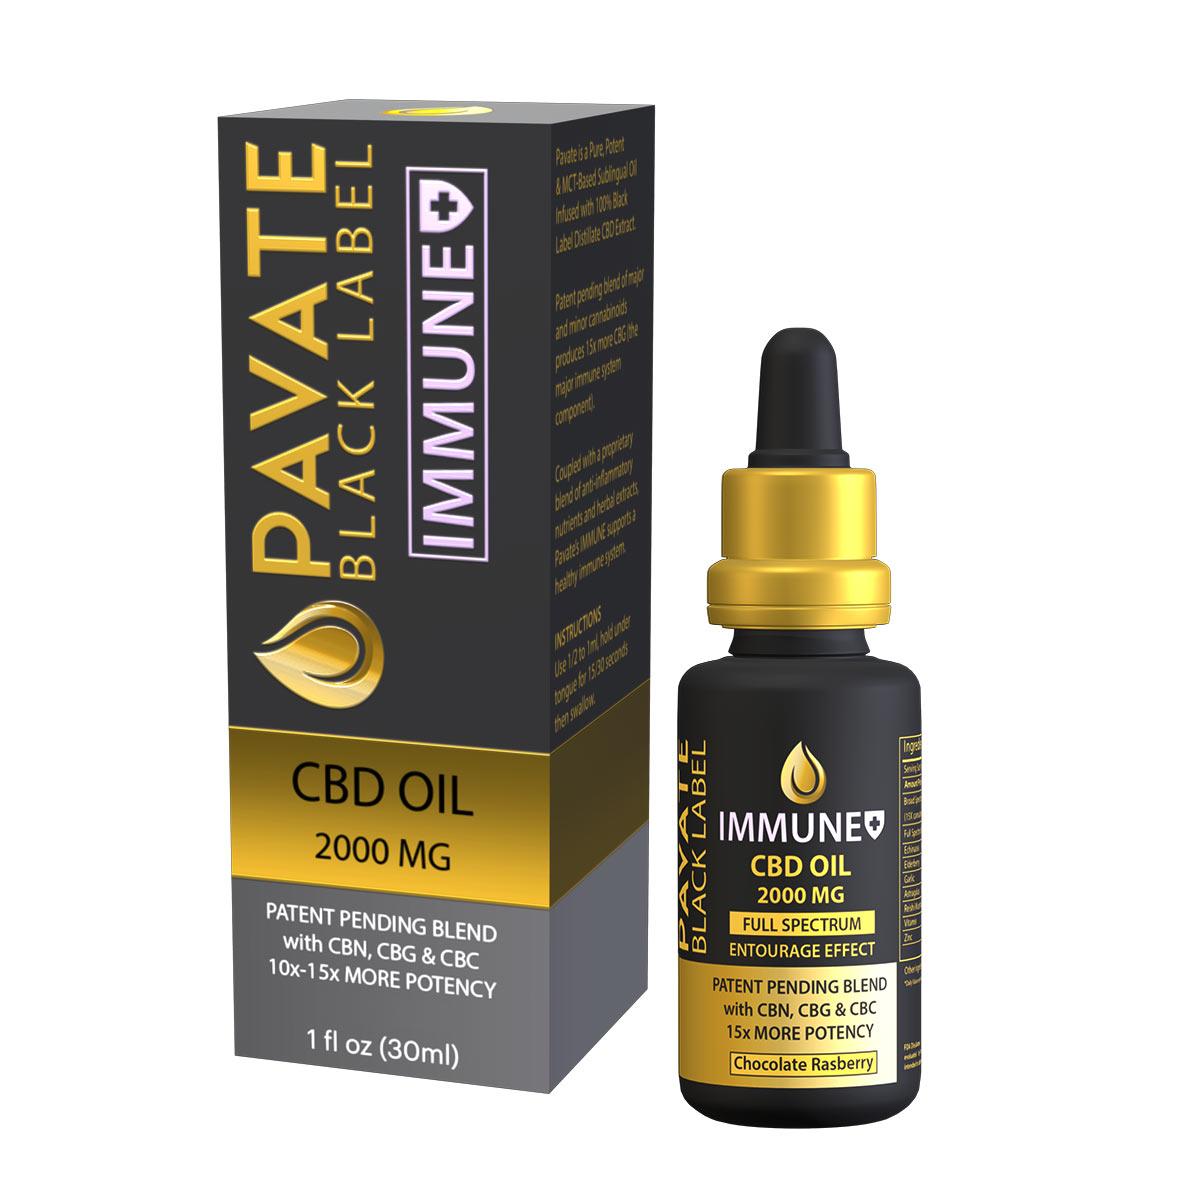 pavate-black-label-immune-cbd-tincture-2000mg-bottle+box